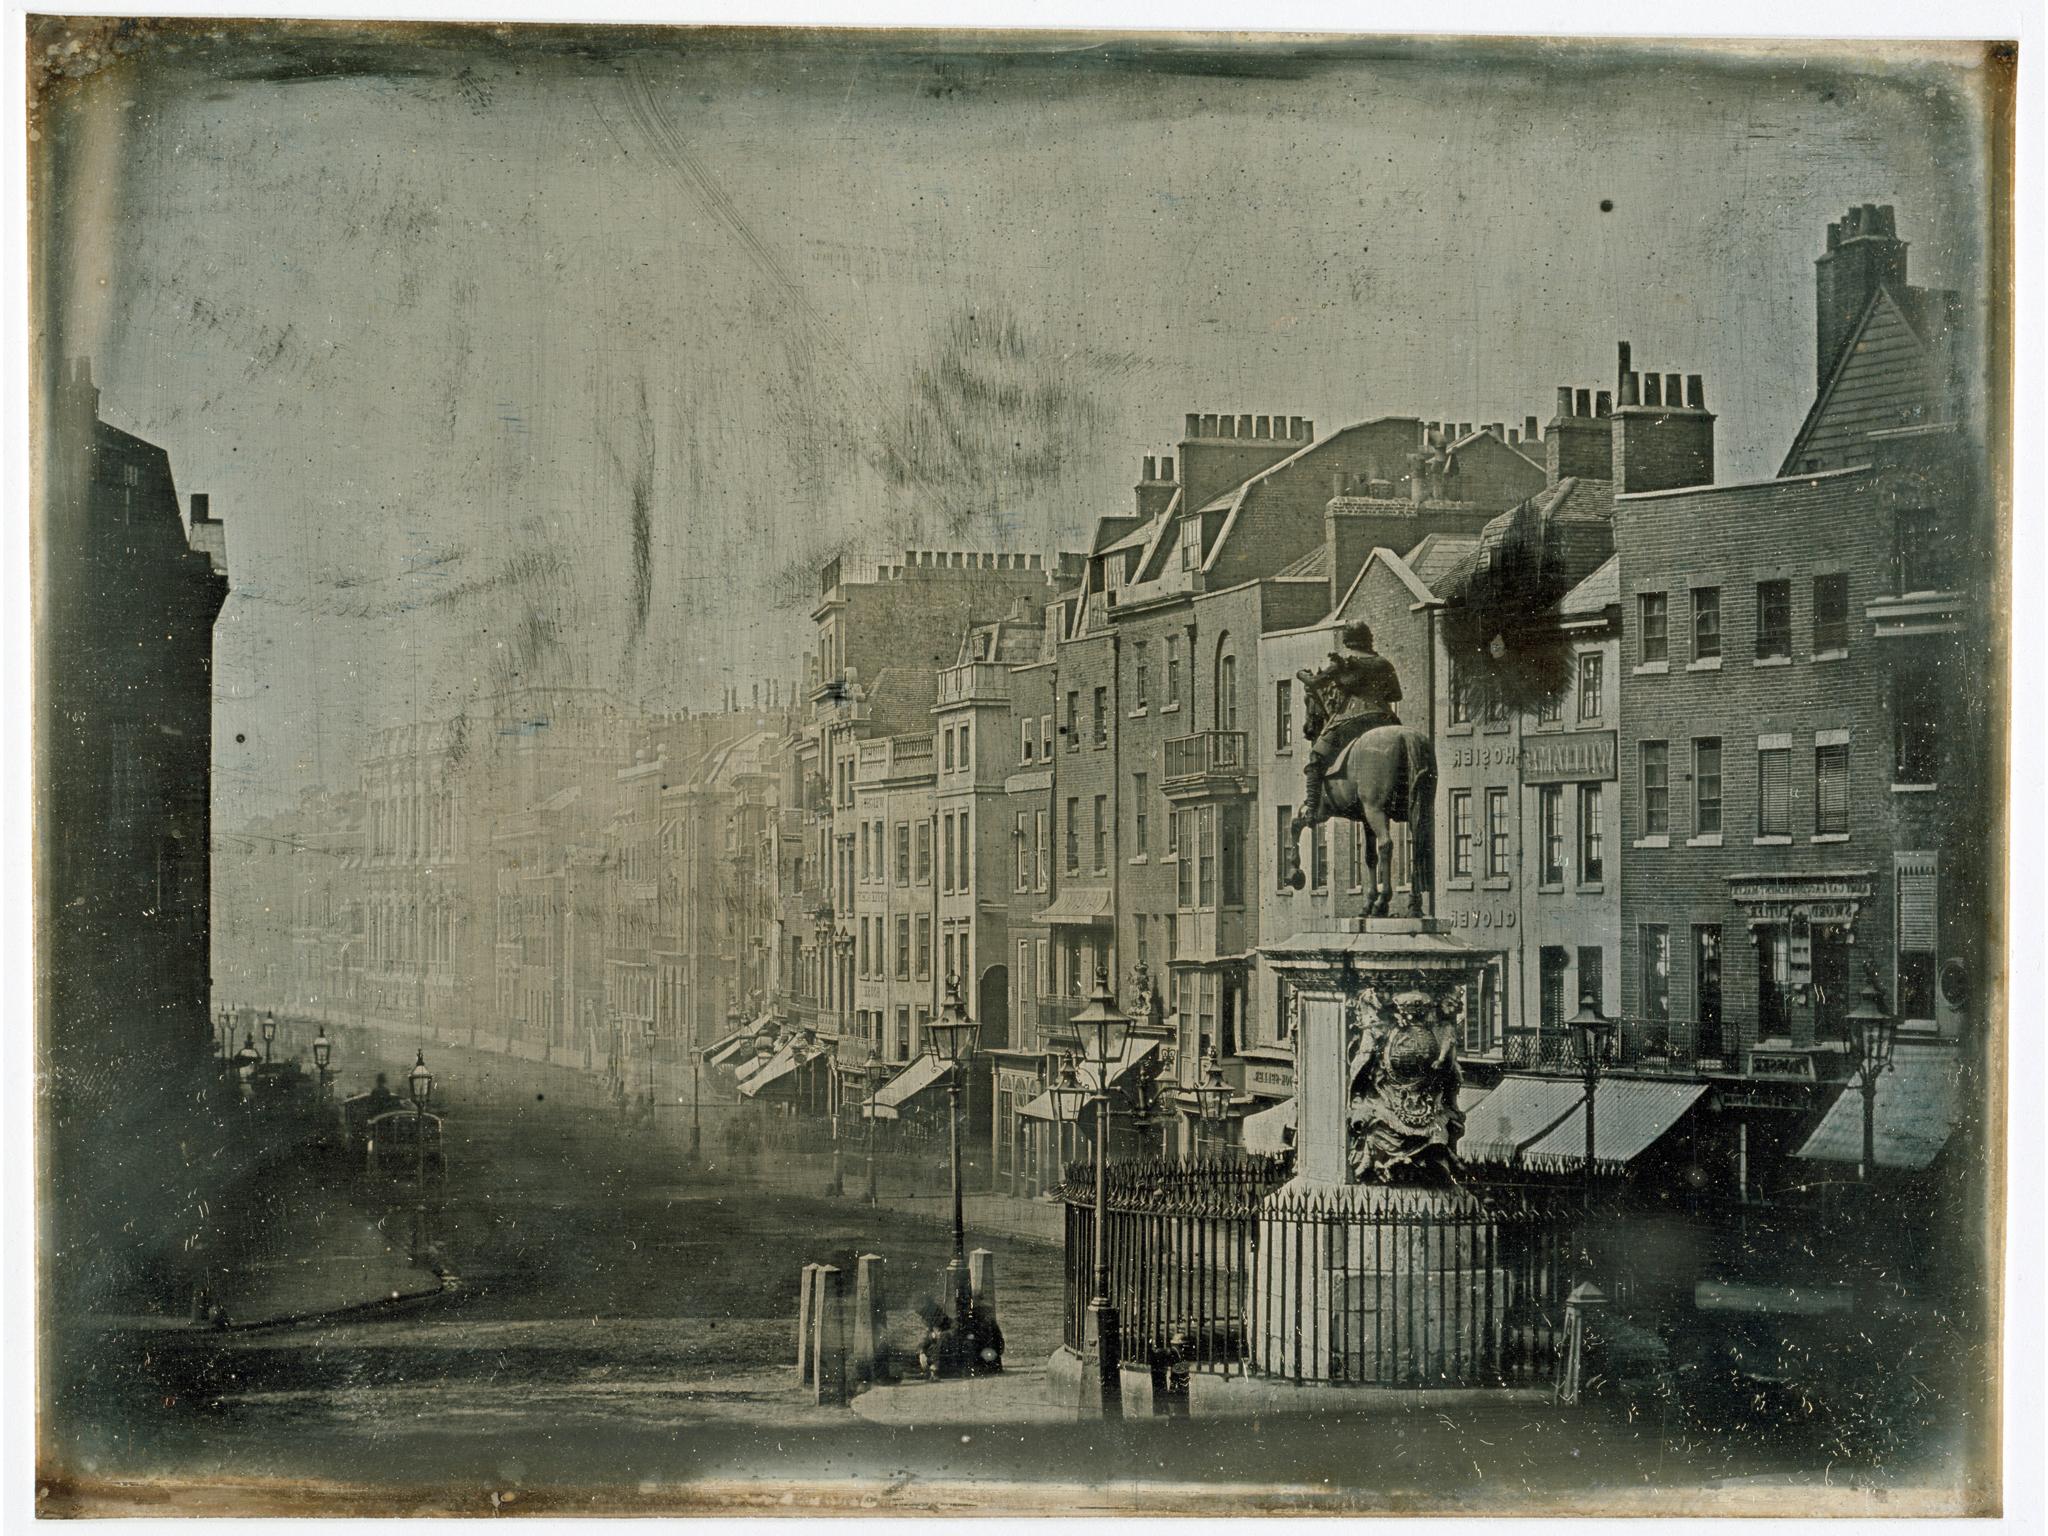 London, 1839<br />Fotó: Monsieur de St Croix: Parliament Street from Trafalgar Square,